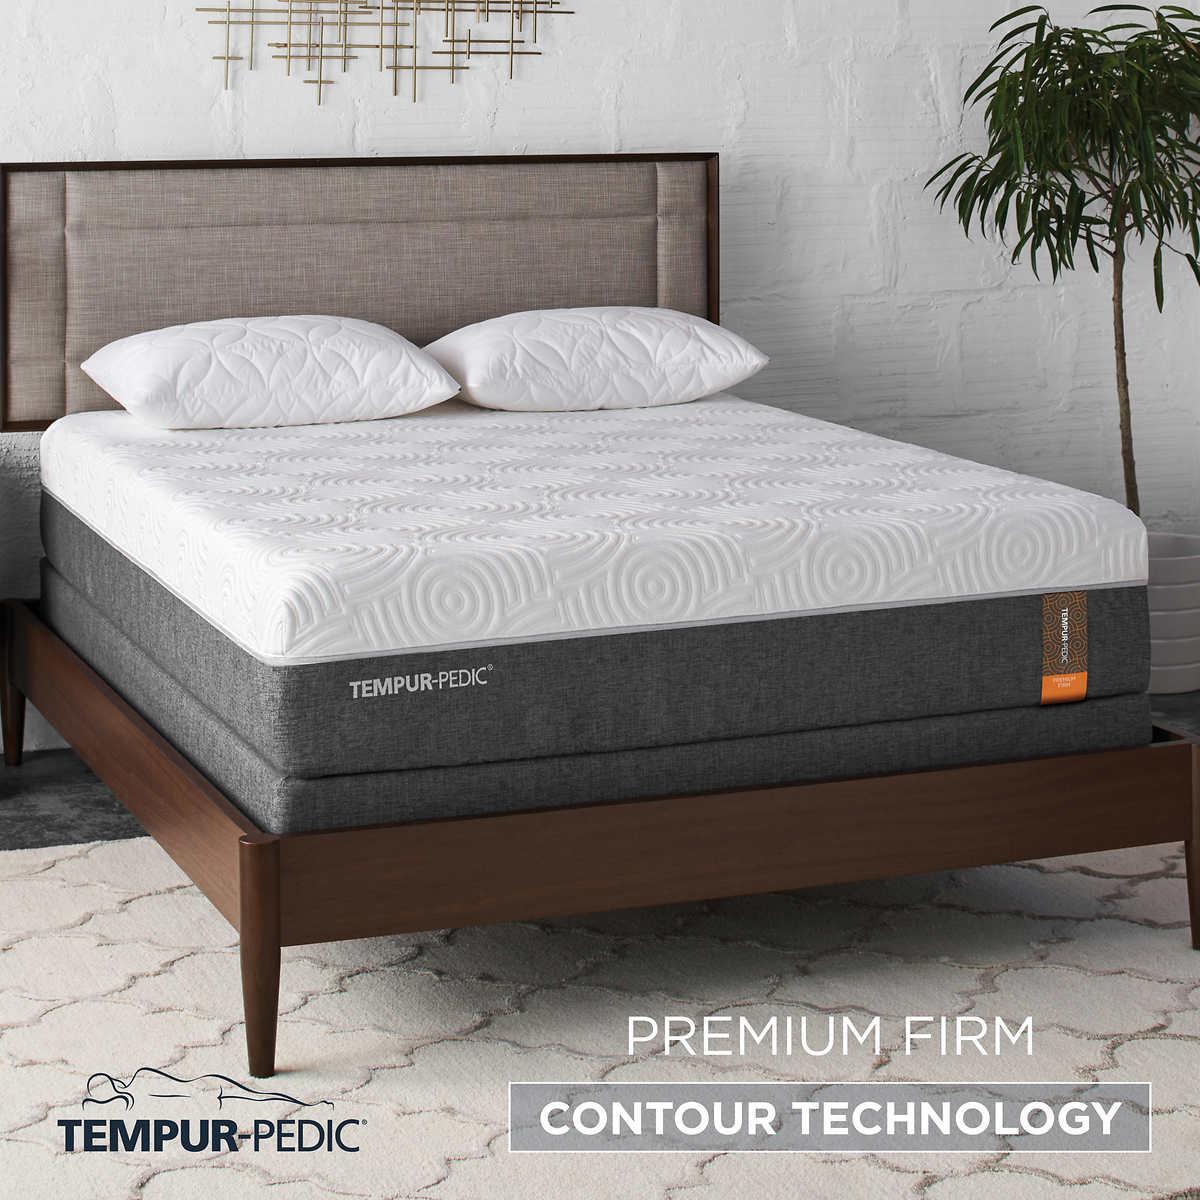 tempur-pedic mattresses | costco